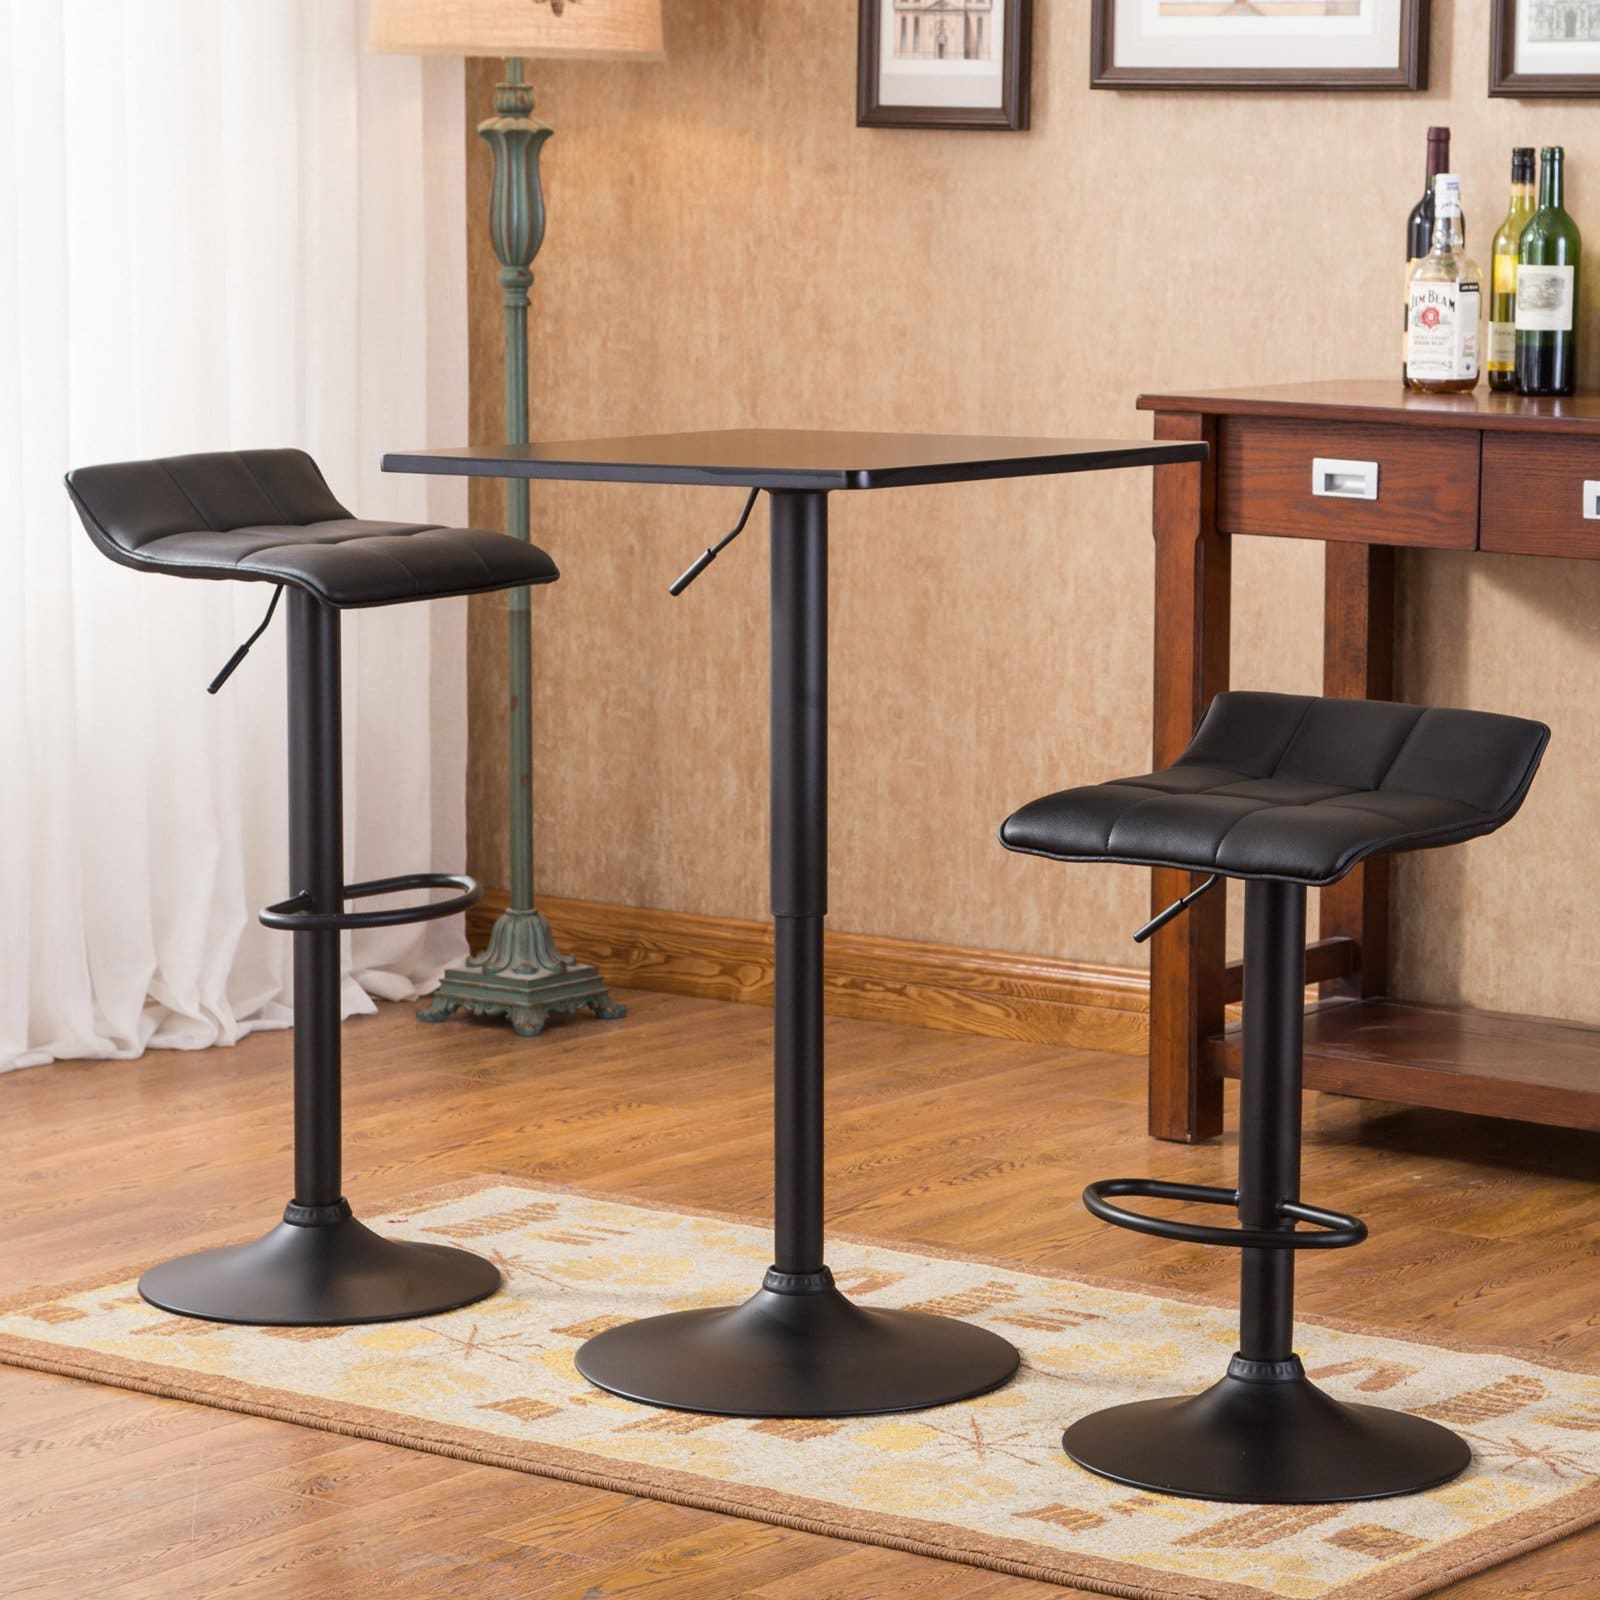 Roundhill Furniture Belham Black Square Top Adjustable Height With Black Leg And Base Metal Bar Table And 2 Swivel Black Bonded Leather Adjustable Bar Stool Bar Sets Walmart Com Walmart Com